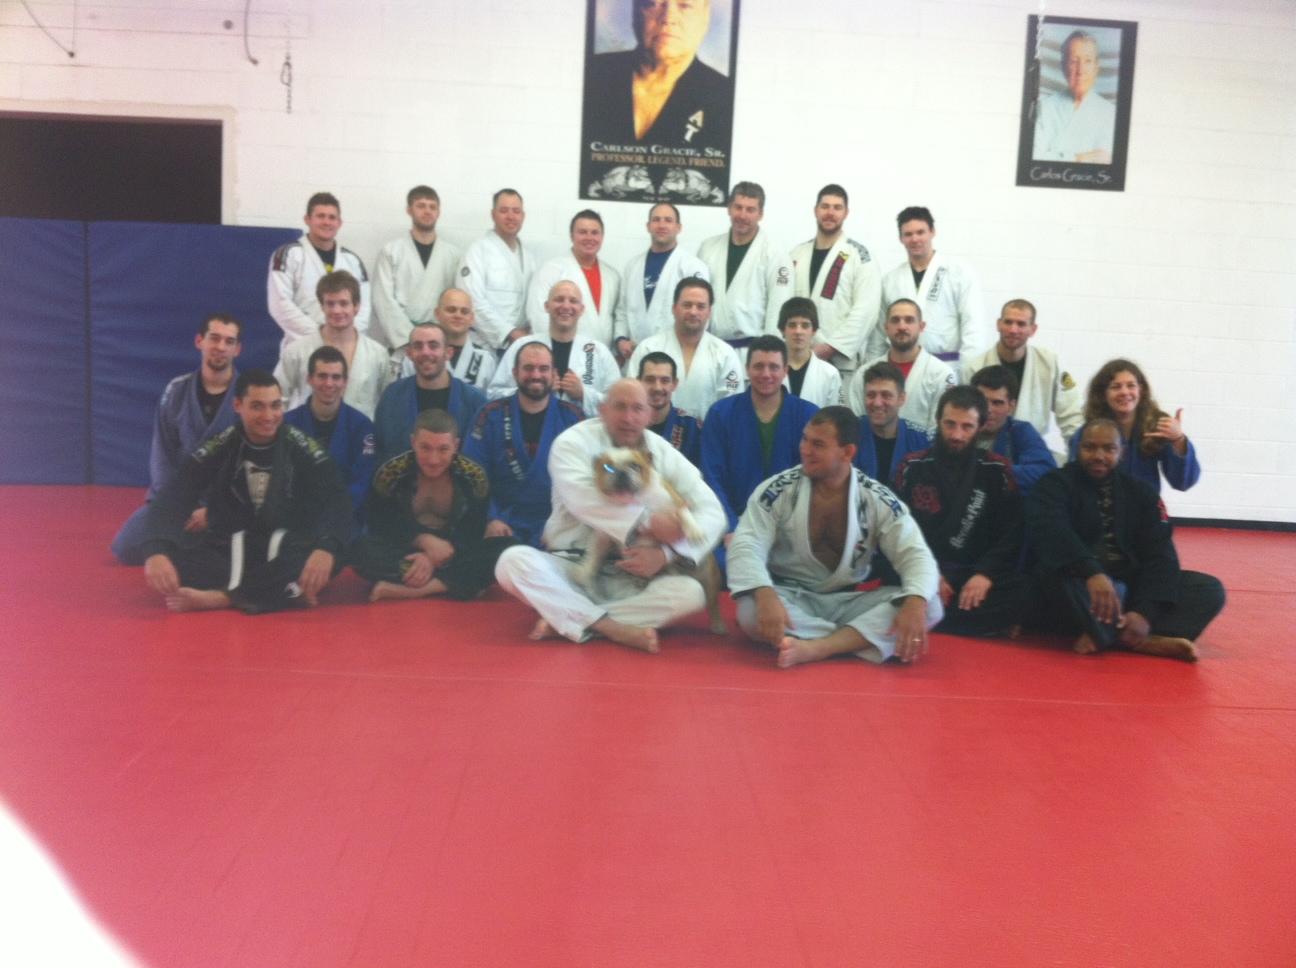 Chuck Anzalone, Cyborg, and the Buffalo BJJ team